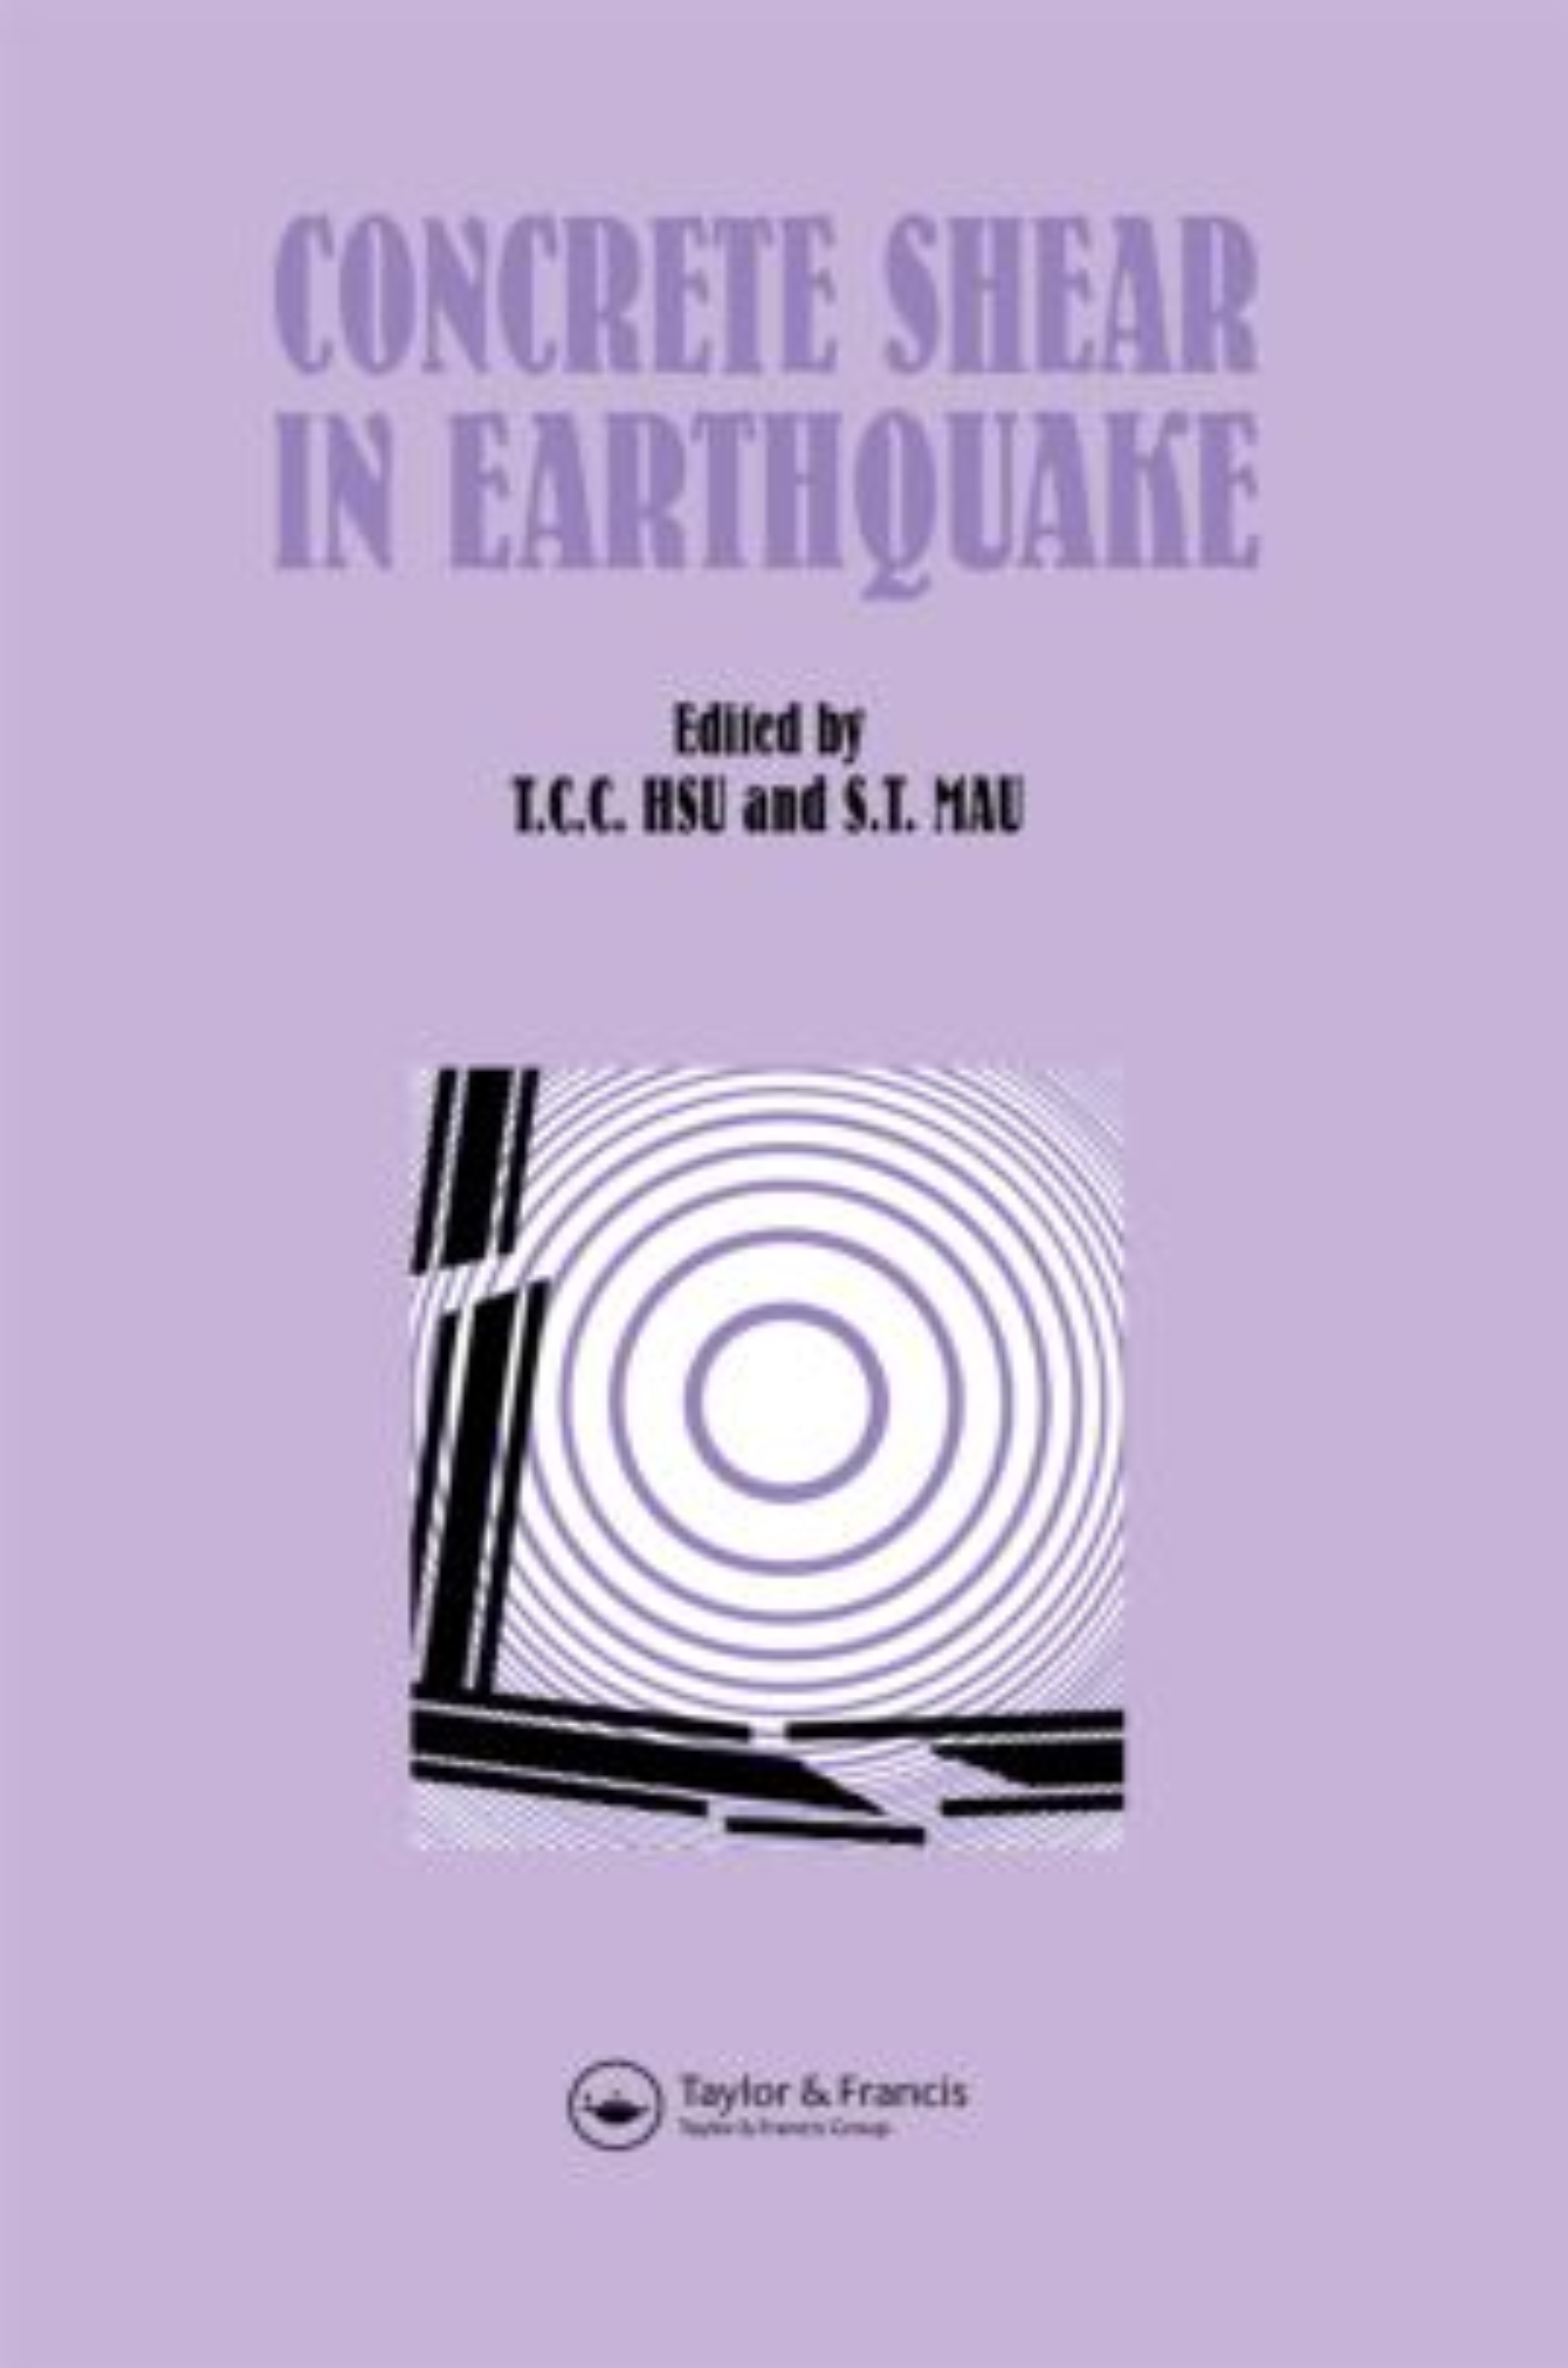 Concrete Shear in Earthquake